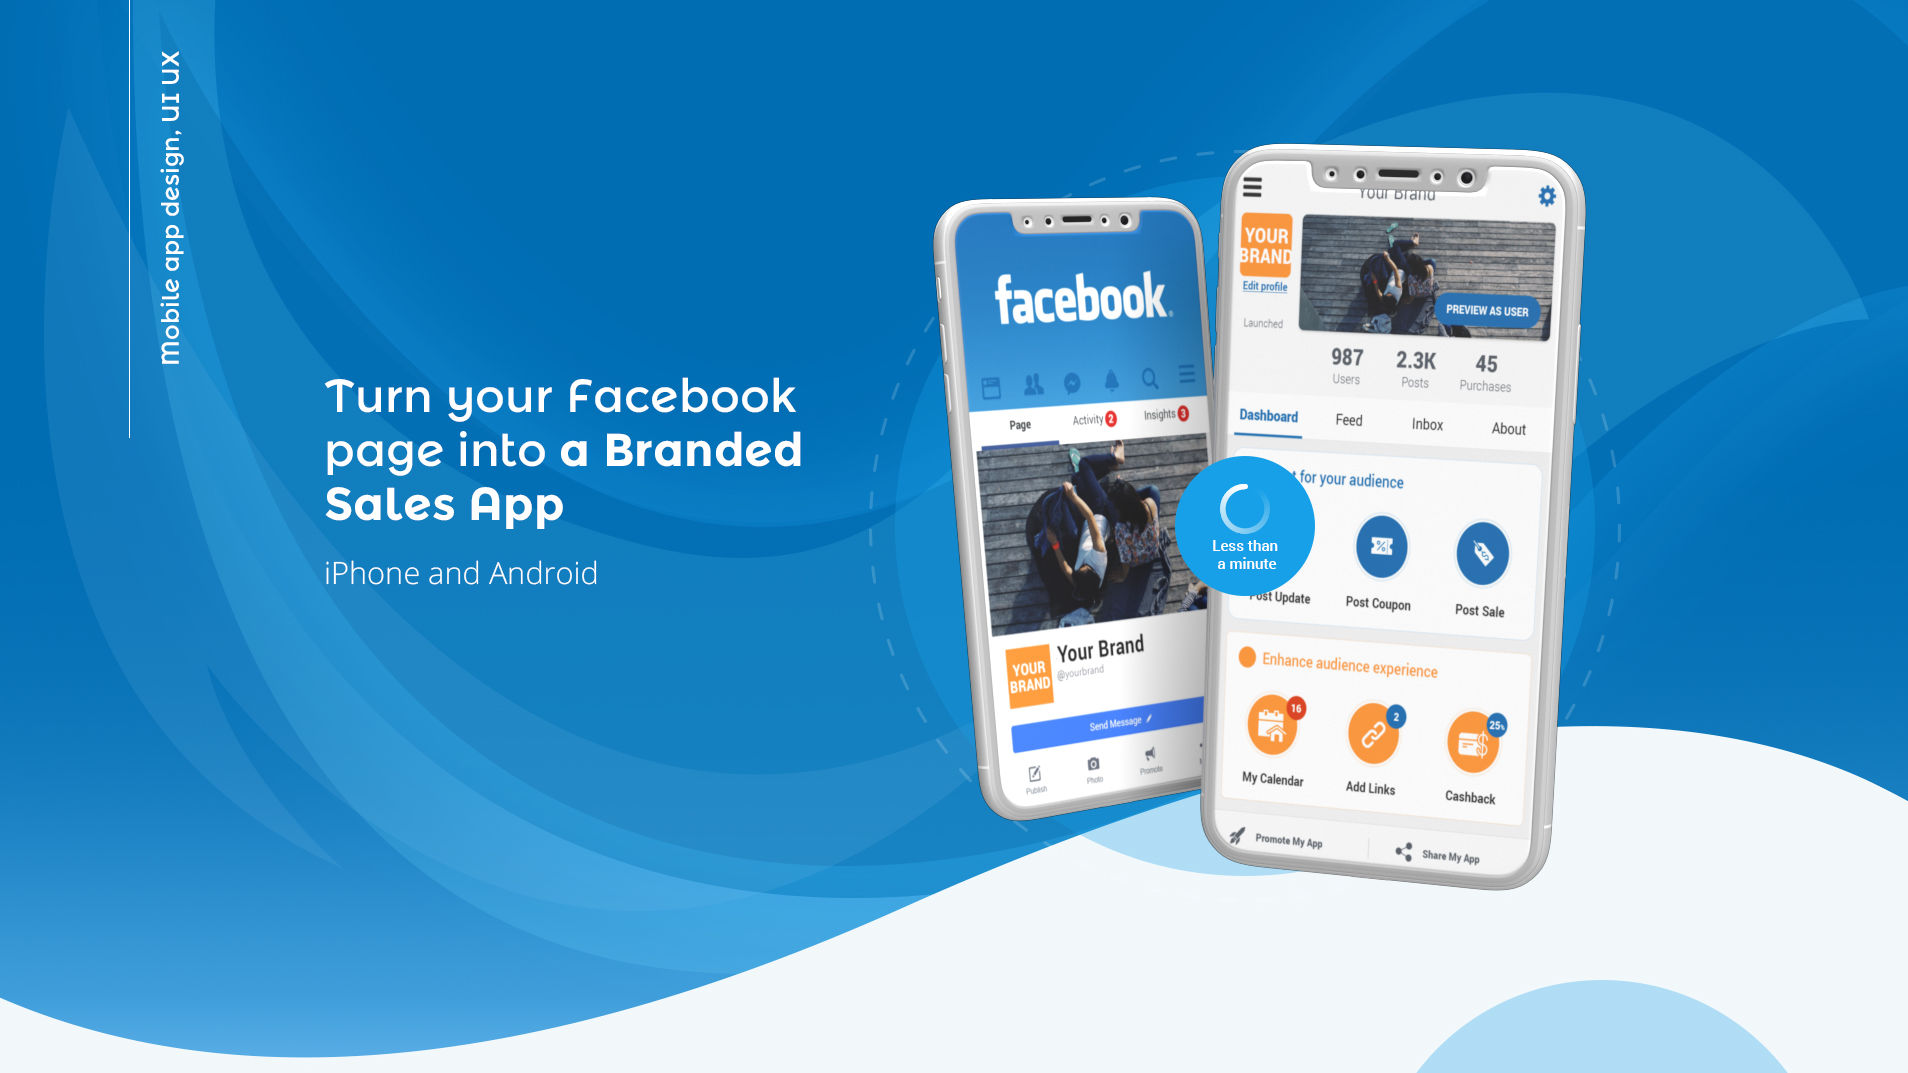 UI UX facebook to app עיצוב אפליקצייה ממשק משתמש appsvillage